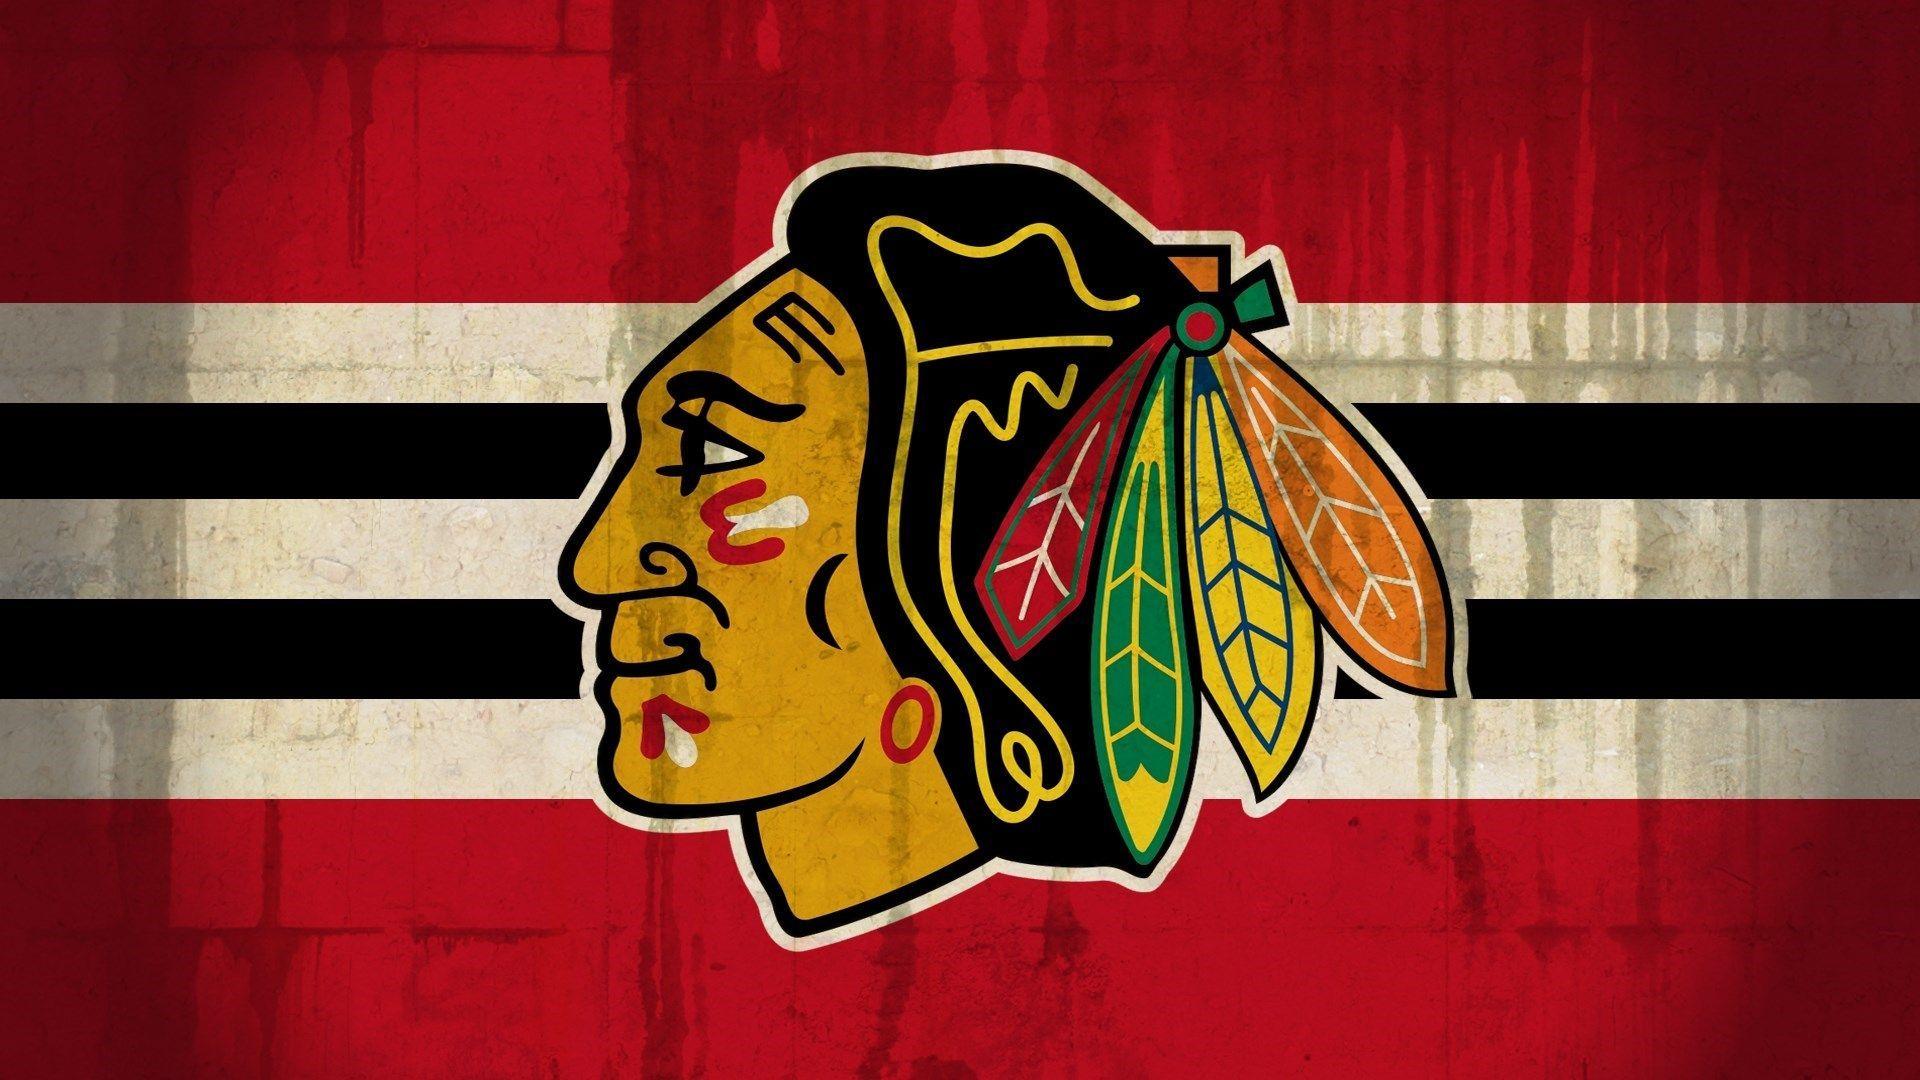 Chicago Sports Desktop Wallpaper Wallpapersafari Chicago Blackhawks Wallpaper Chicago Blackhawks Logo Nhl Blackhawks